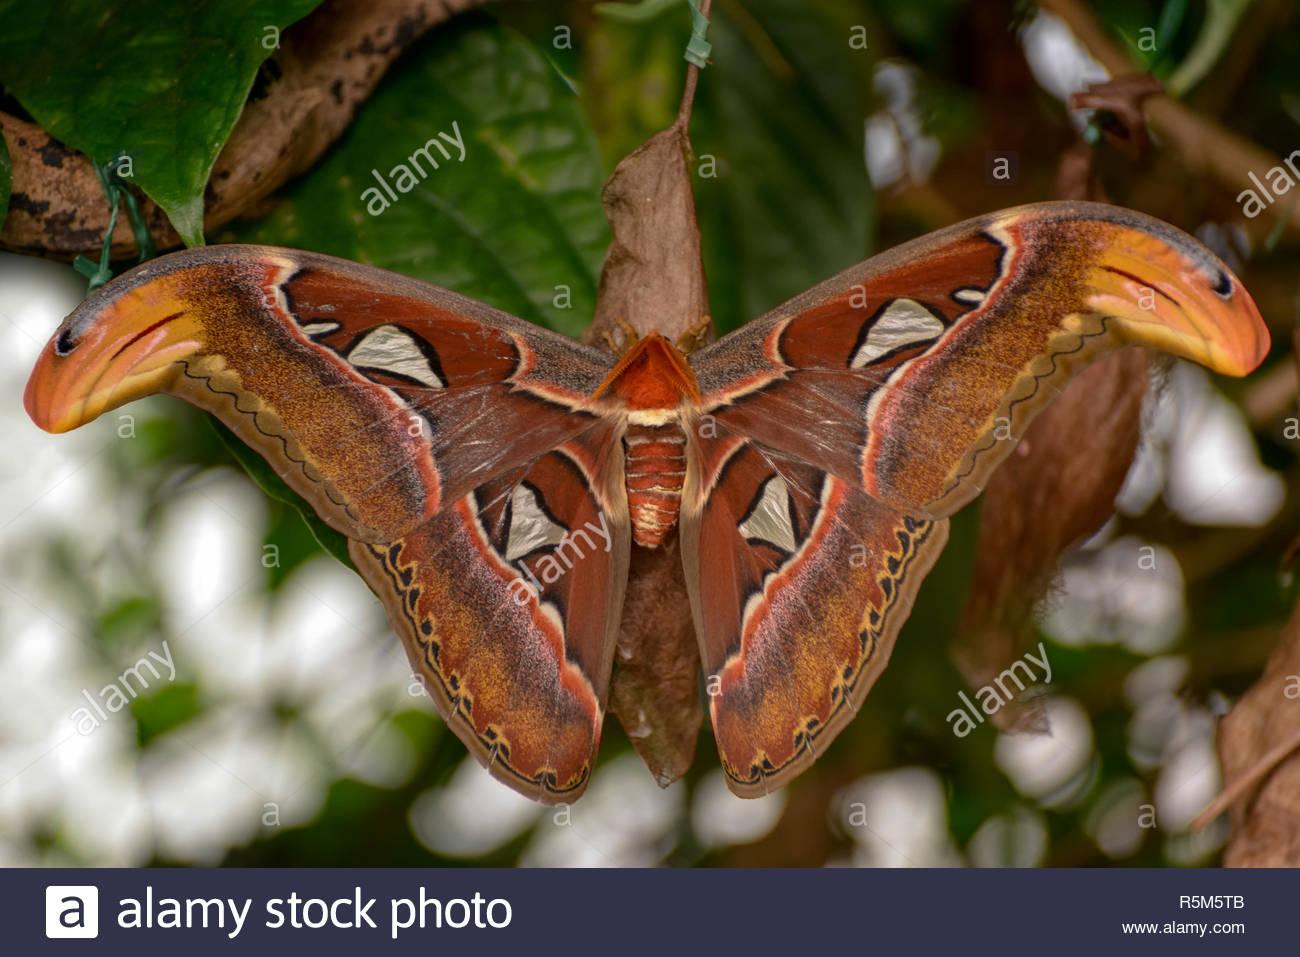 Atlas Moth (Attacus atlas) - Stock Image